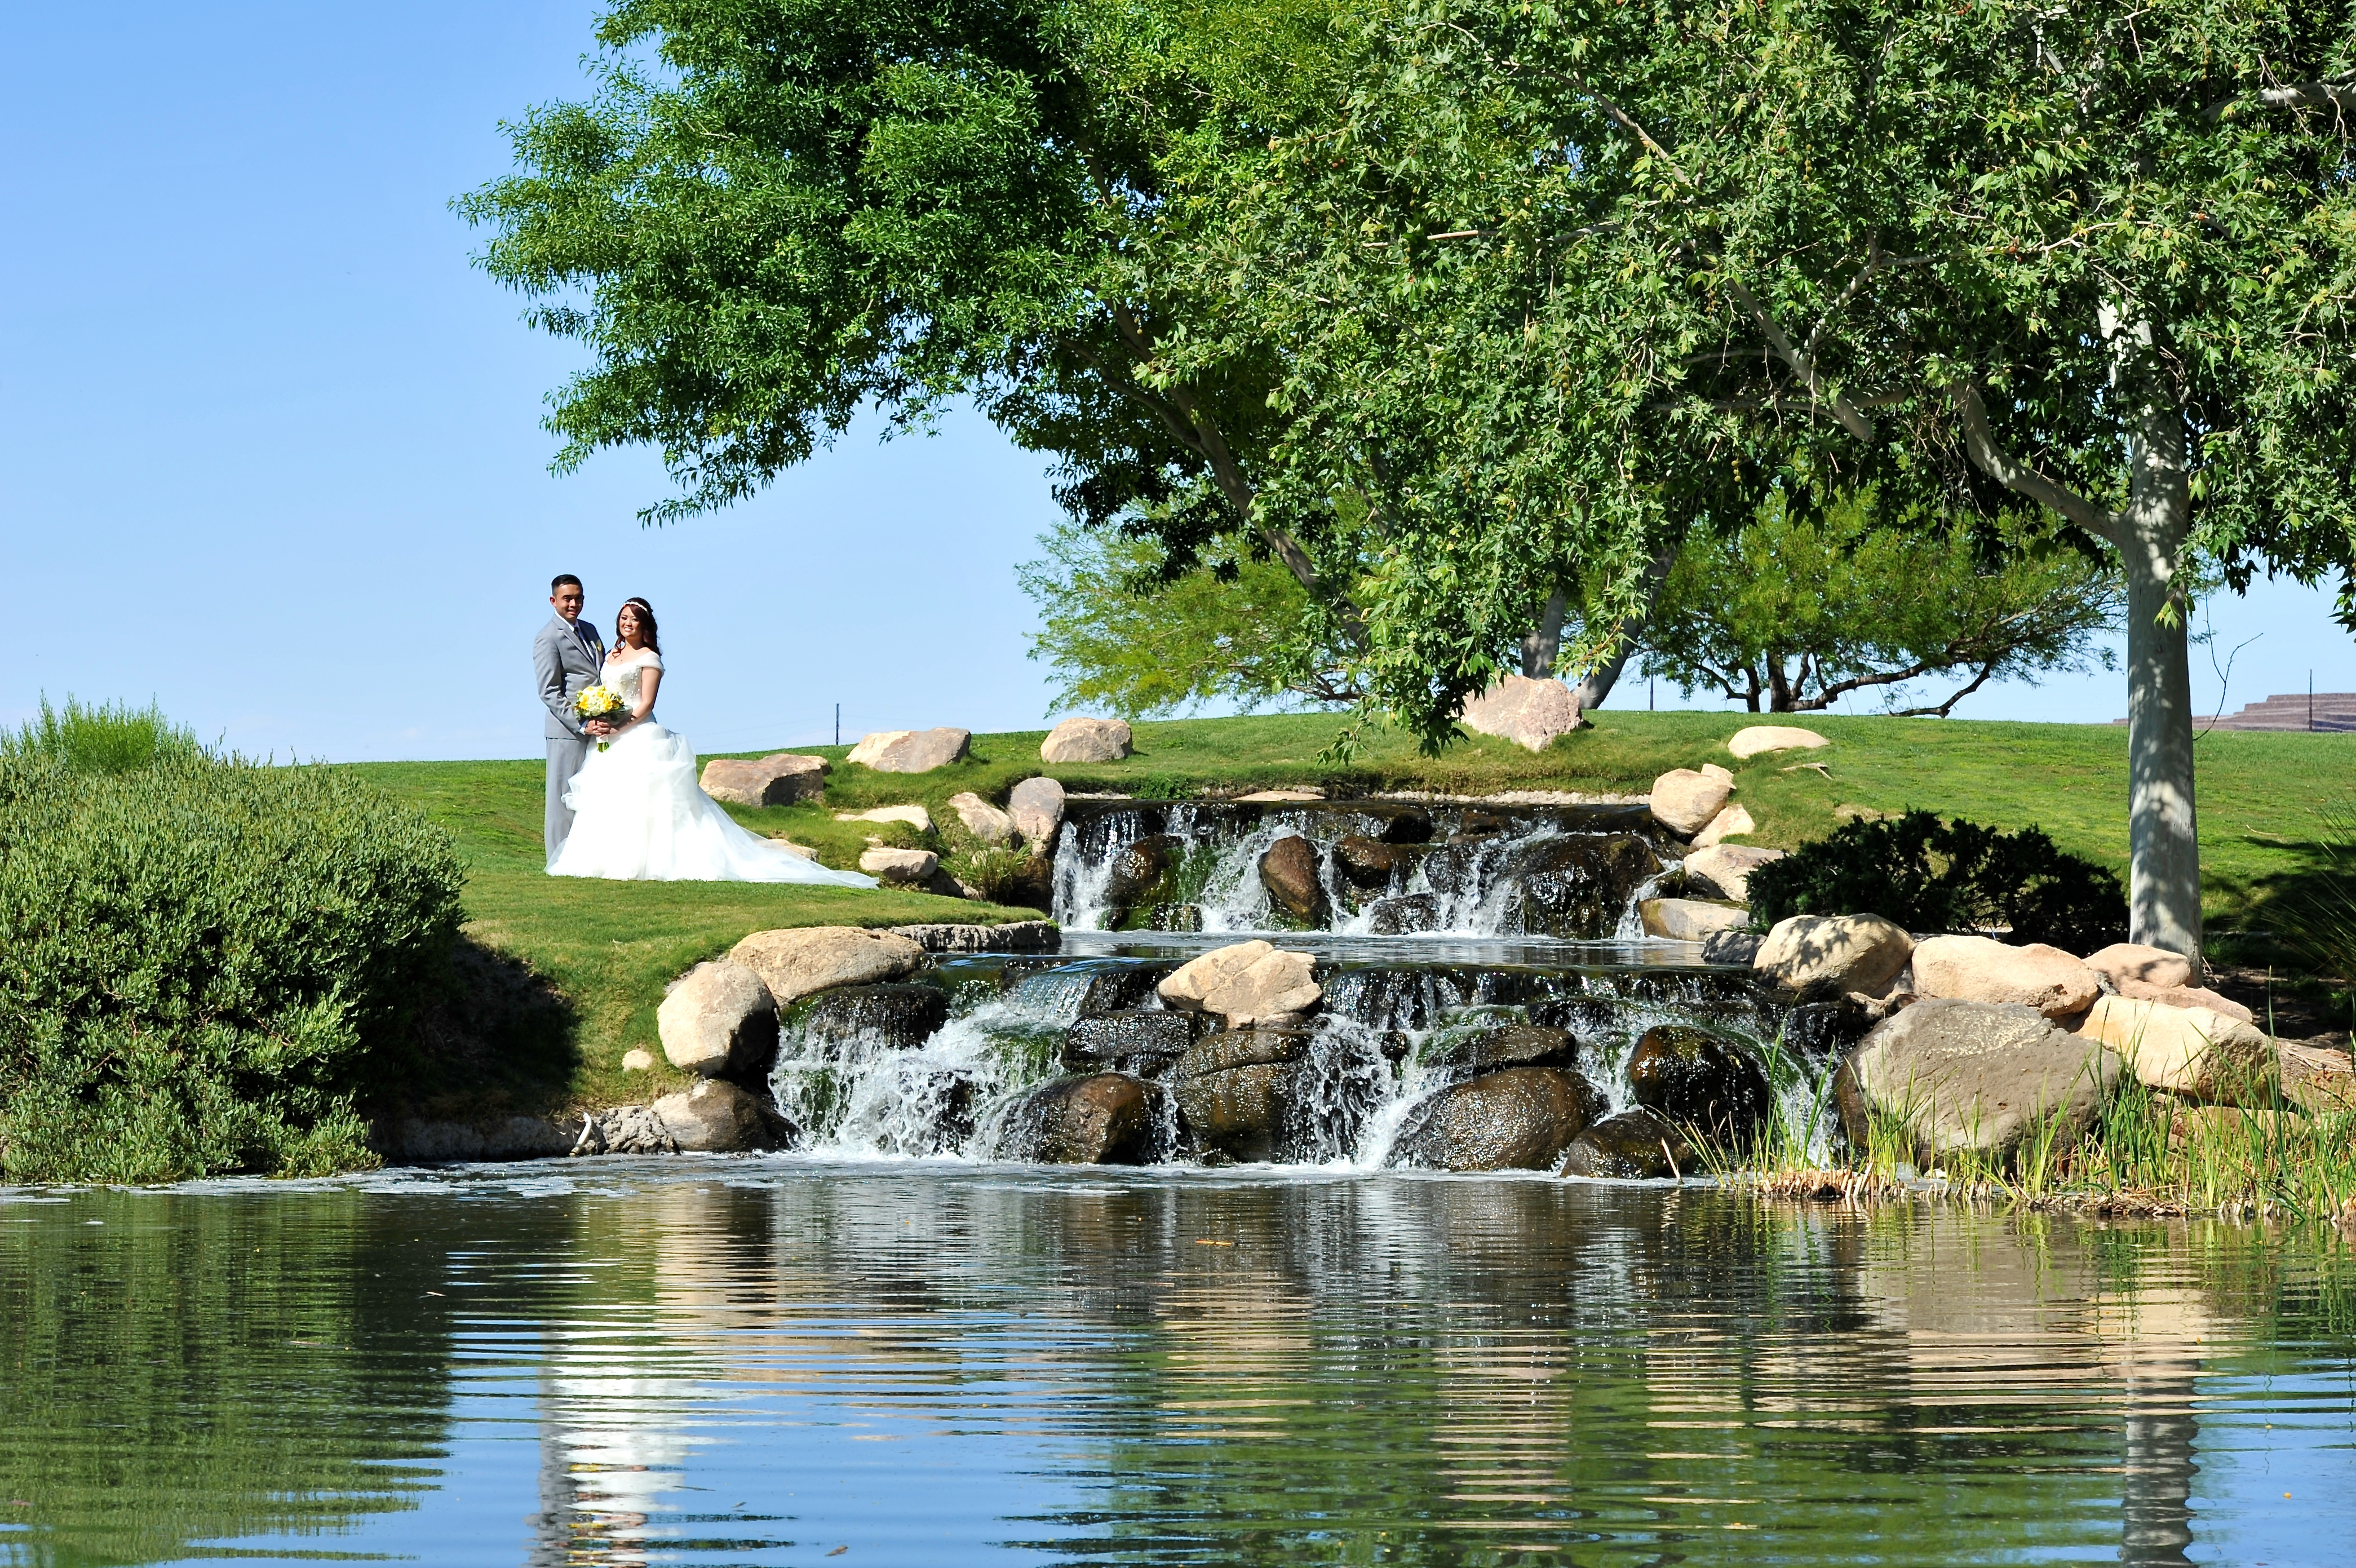 las vegas wedding videographers, memory lane video, anthem country club weddings, josh derek photography, weddings, las vegas weddings